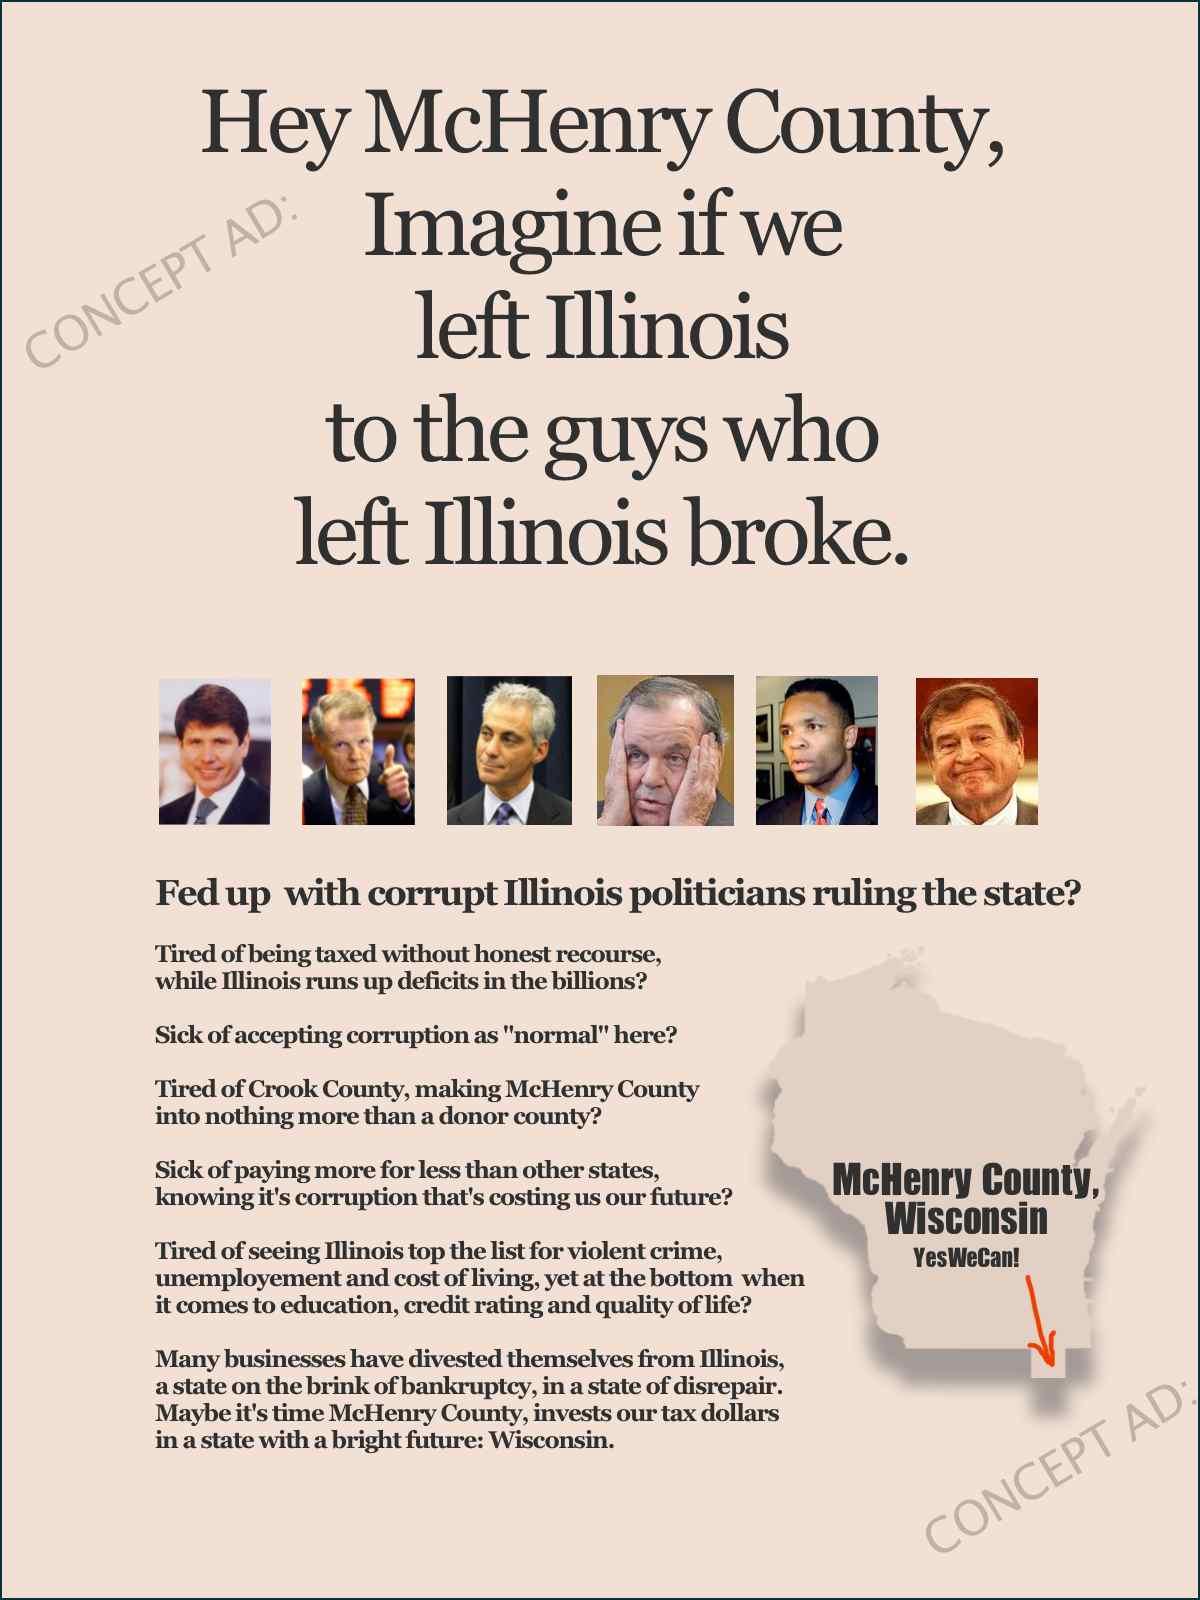 Left Illinois concept ad